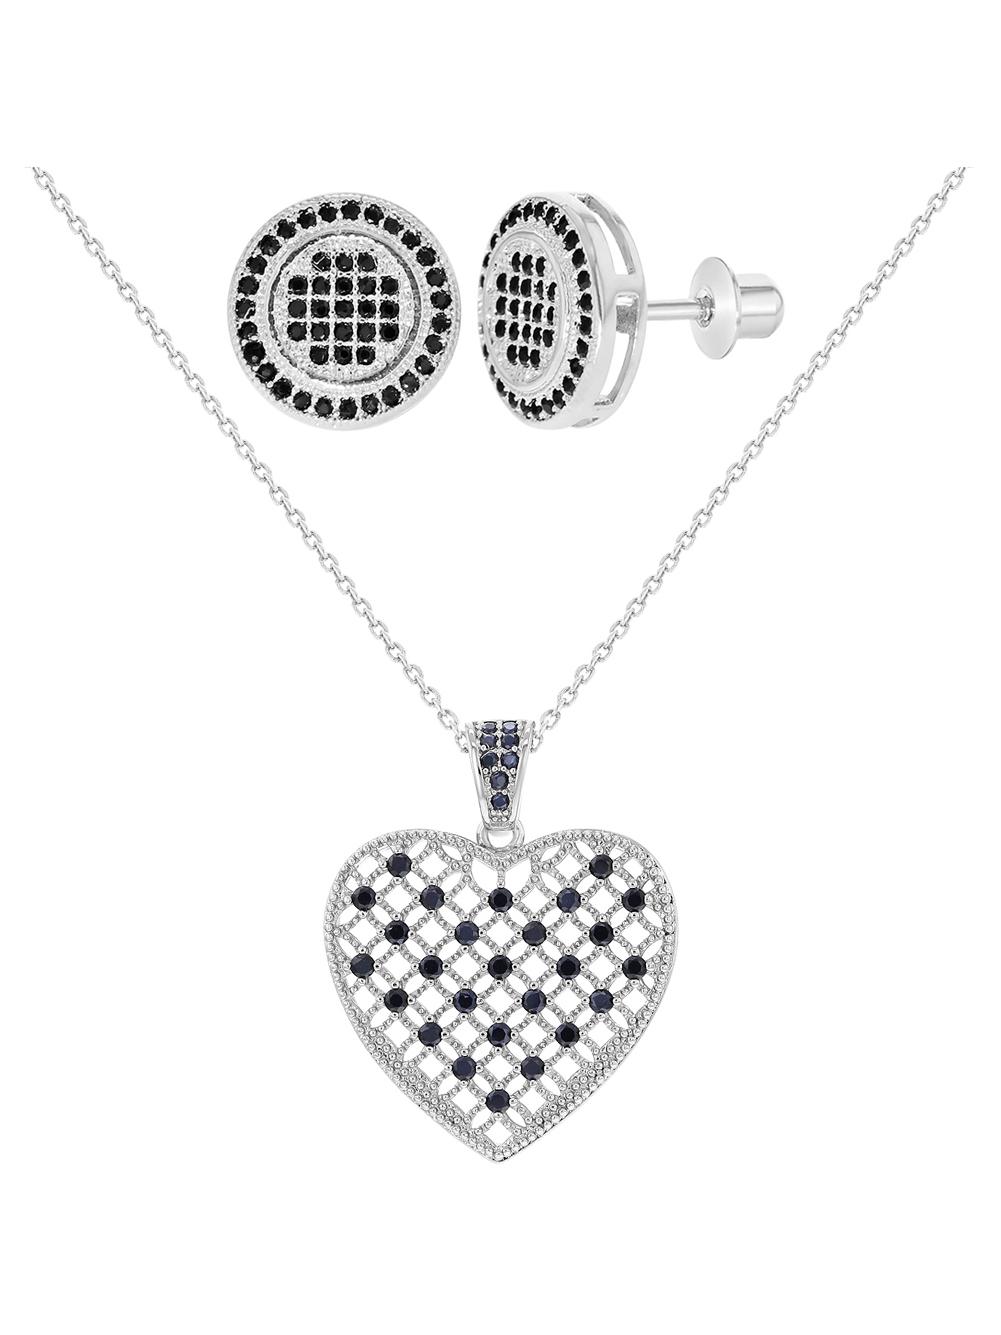 Rhodium Plated Black CZ Screw Back Earrings Heart Pendant Jewelry Set for Women